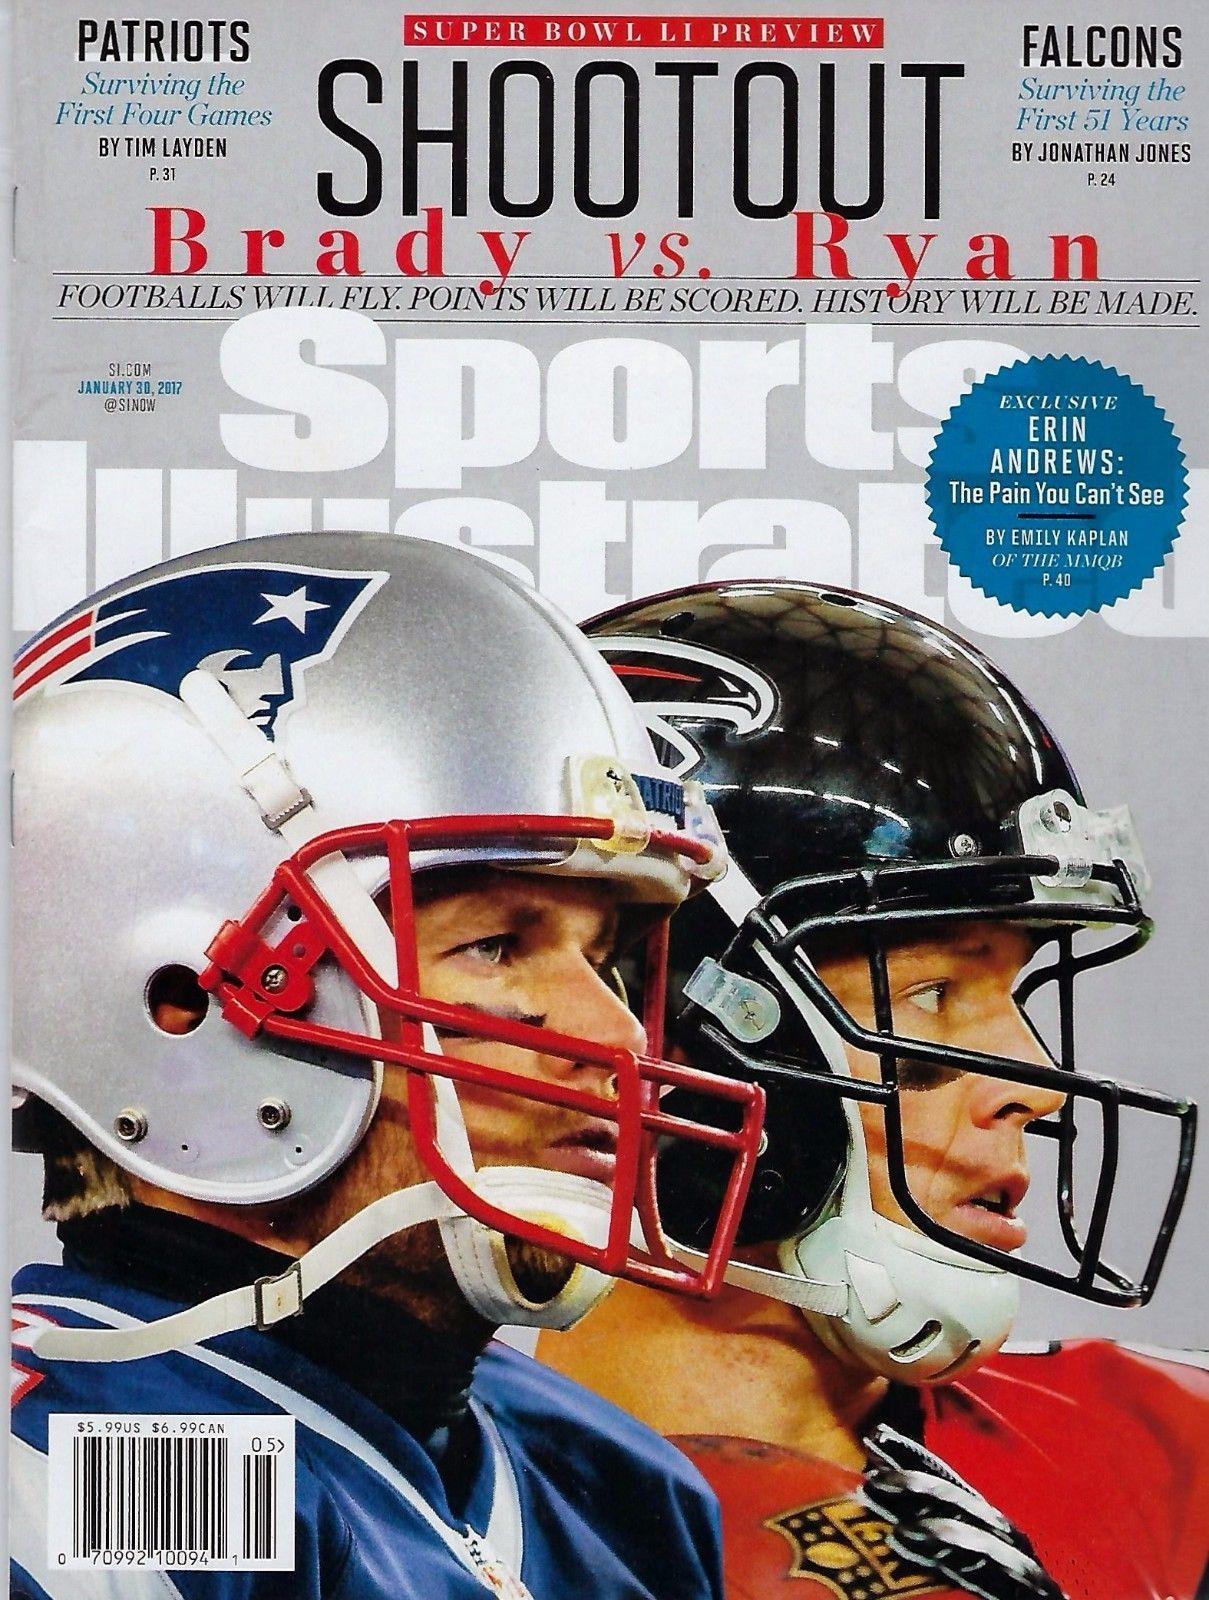 New Sports Illustrated Super Bowl Li Preview Tom Brady Patriots M Ryan No Label Sports Illustrated New England Patriots Football Tom Brady Patriots